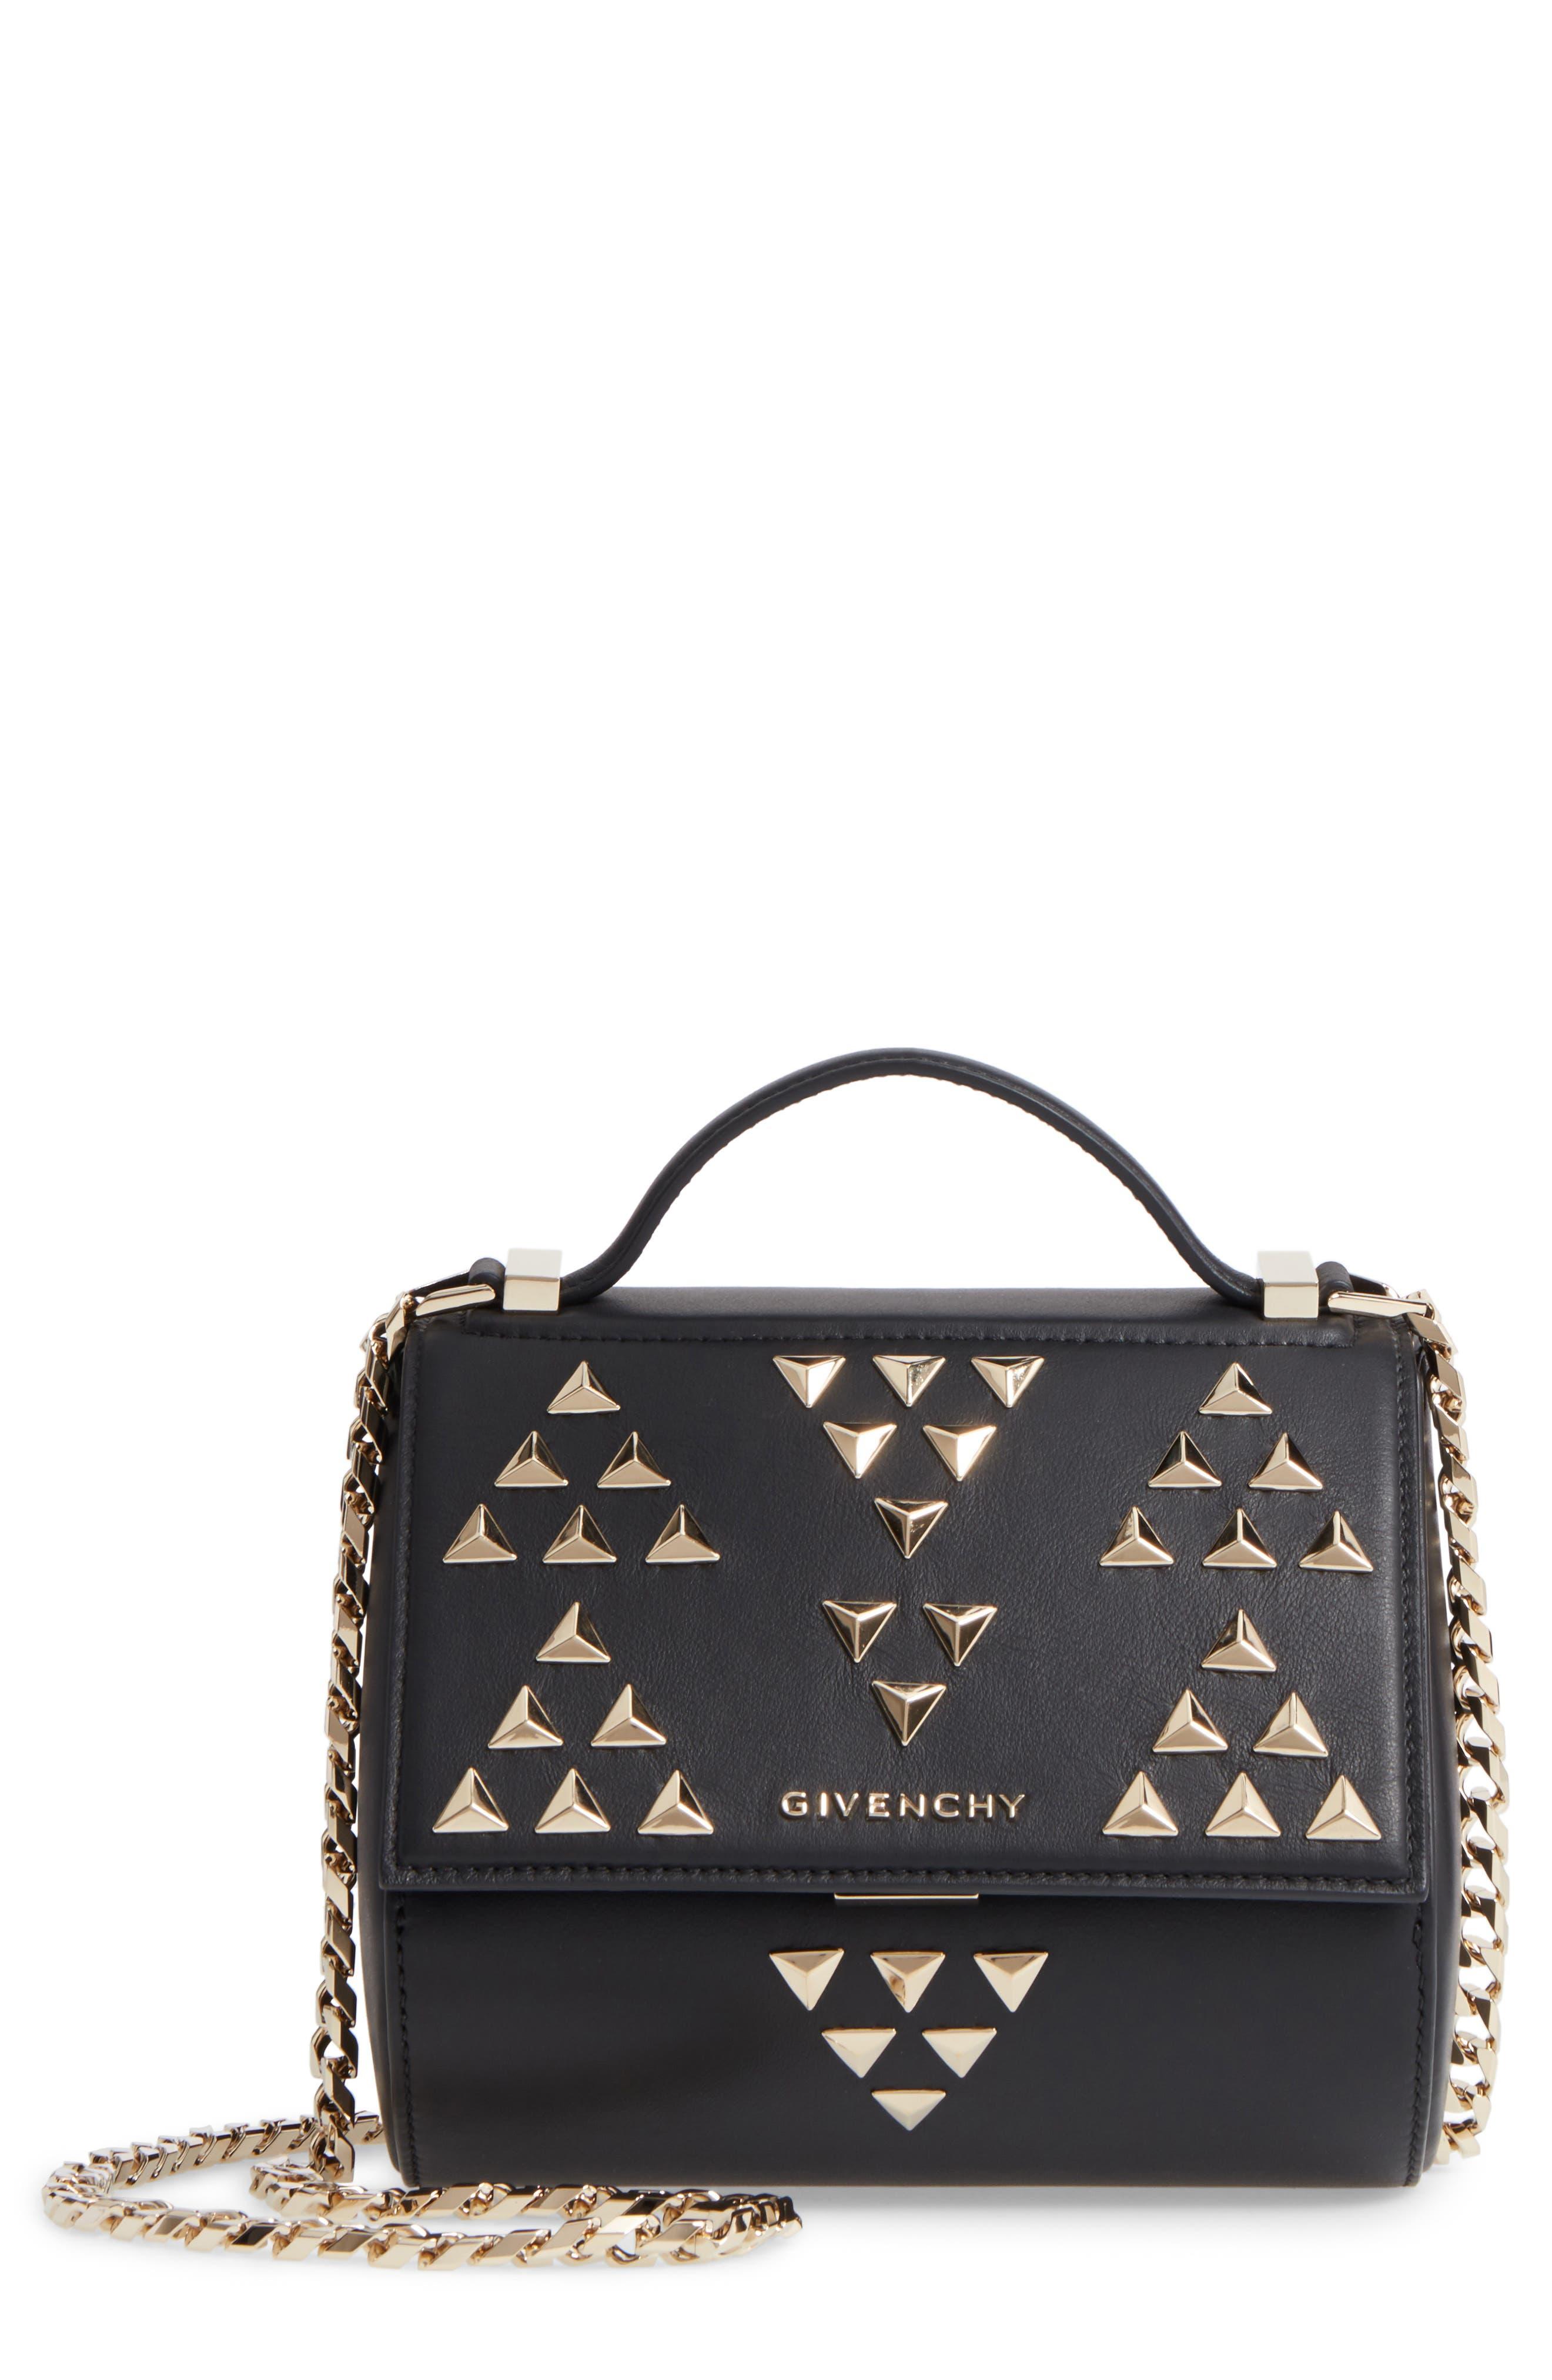 Givenchy Pandora Box Calfskin Leather Top Handle Satchel